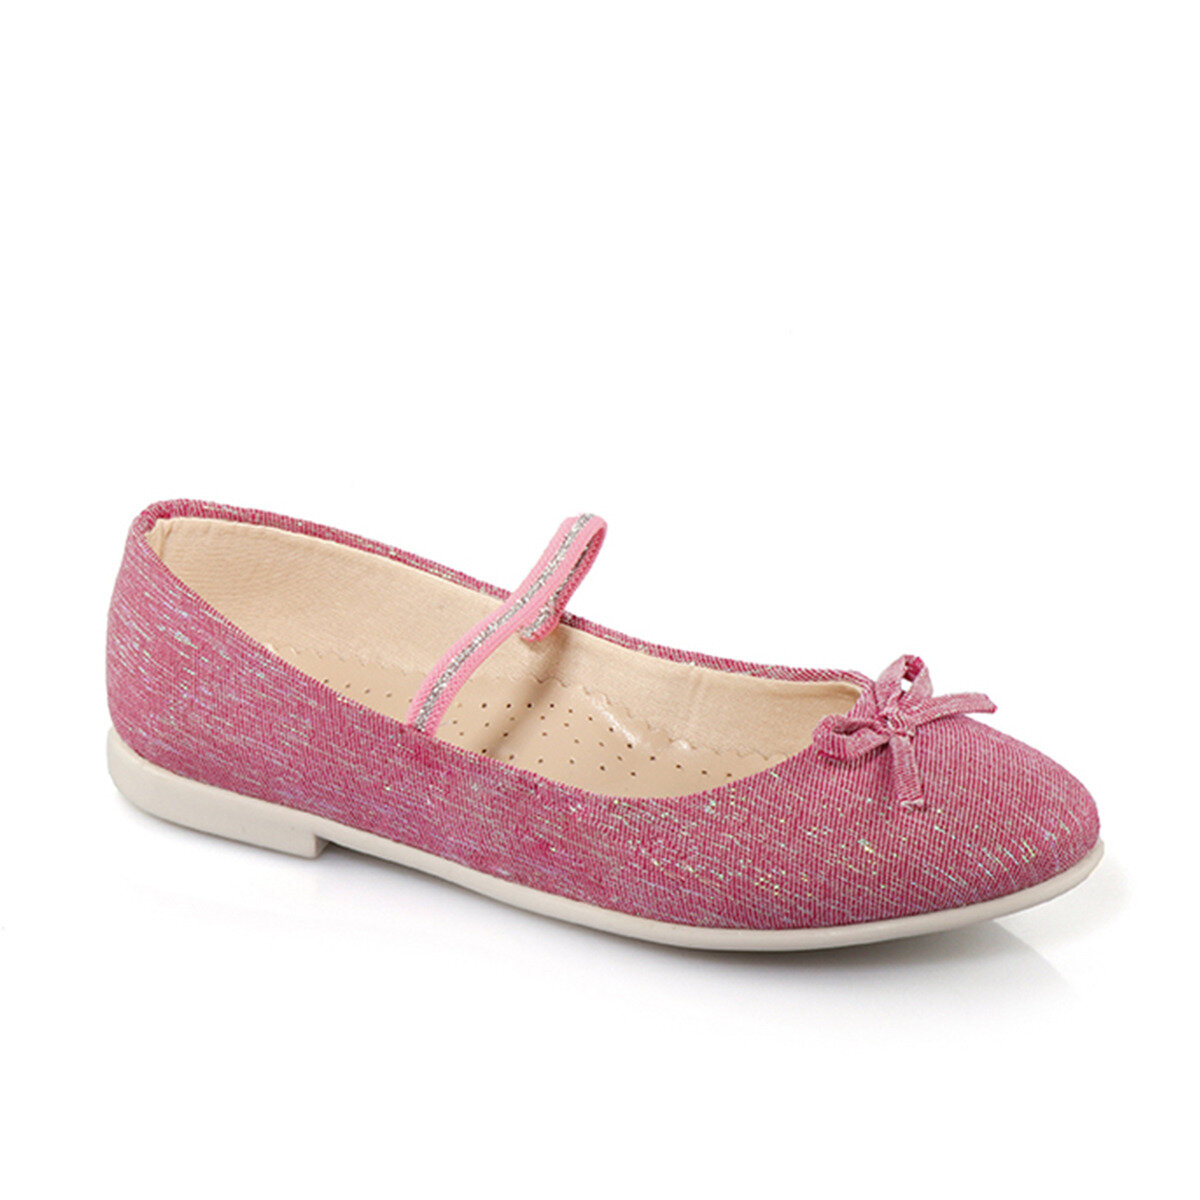 FLO 936.18Y. 735 BOOTIES BALLERINA Fuchsia Girls Kids Ballerina VICCO